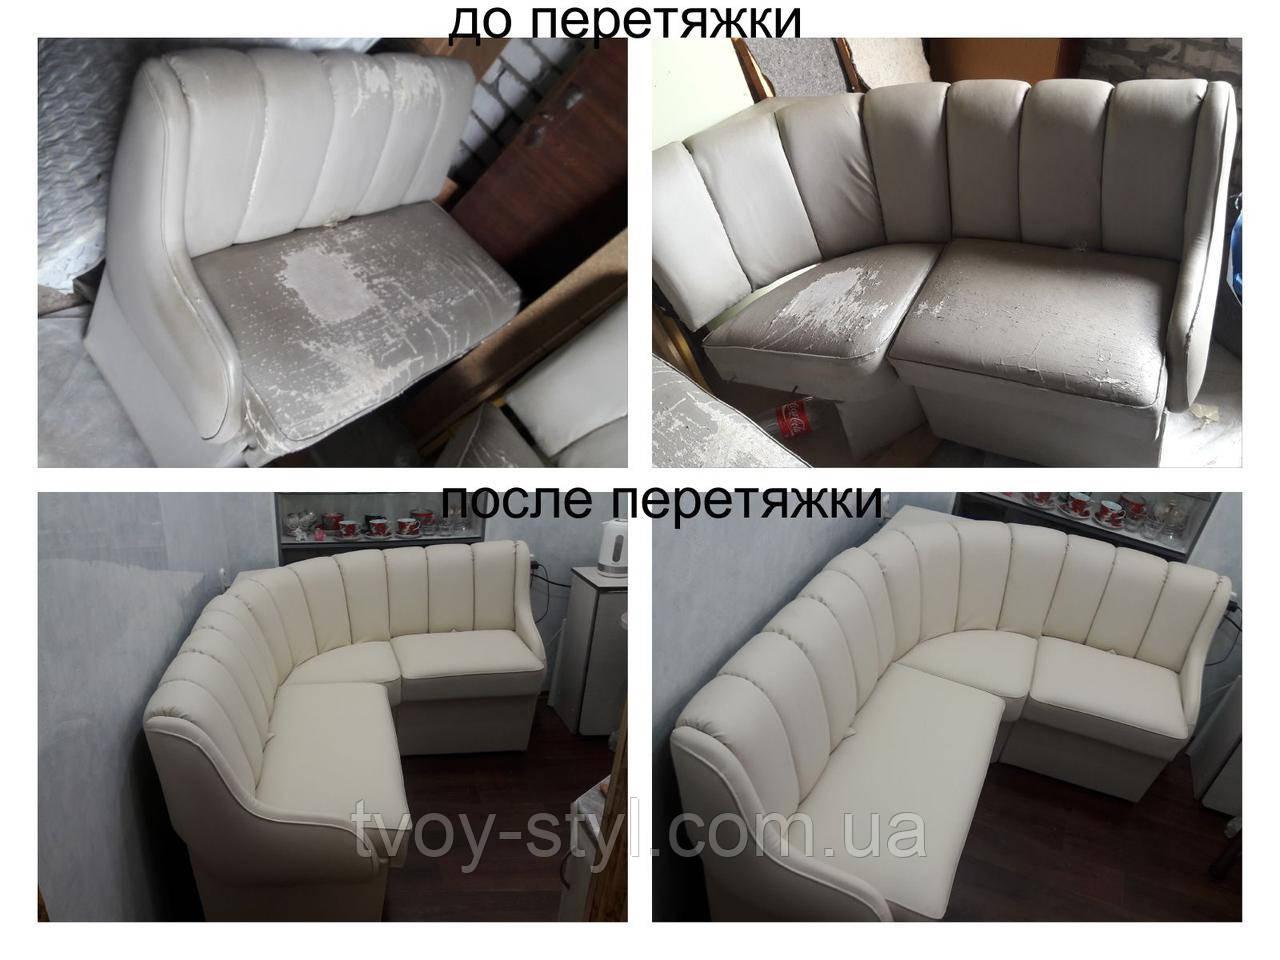 Перетяжка мебели Днепр